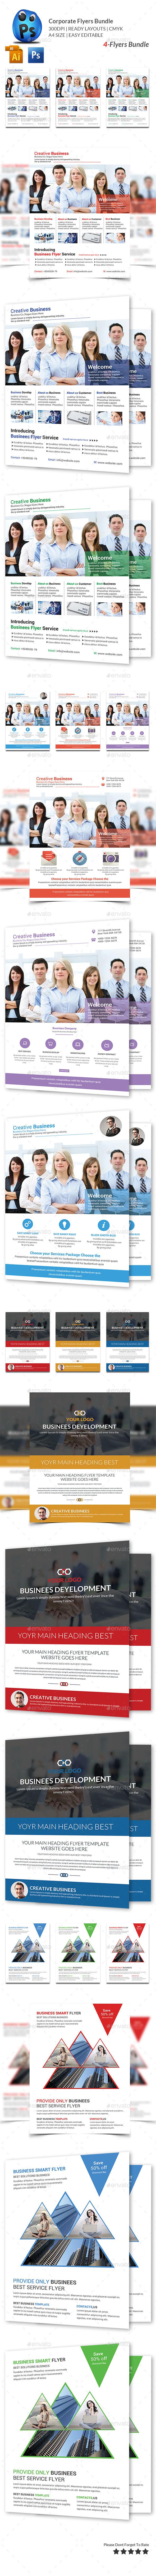 Corporate Business 4 Flyer Bundle - Corporate Flyers